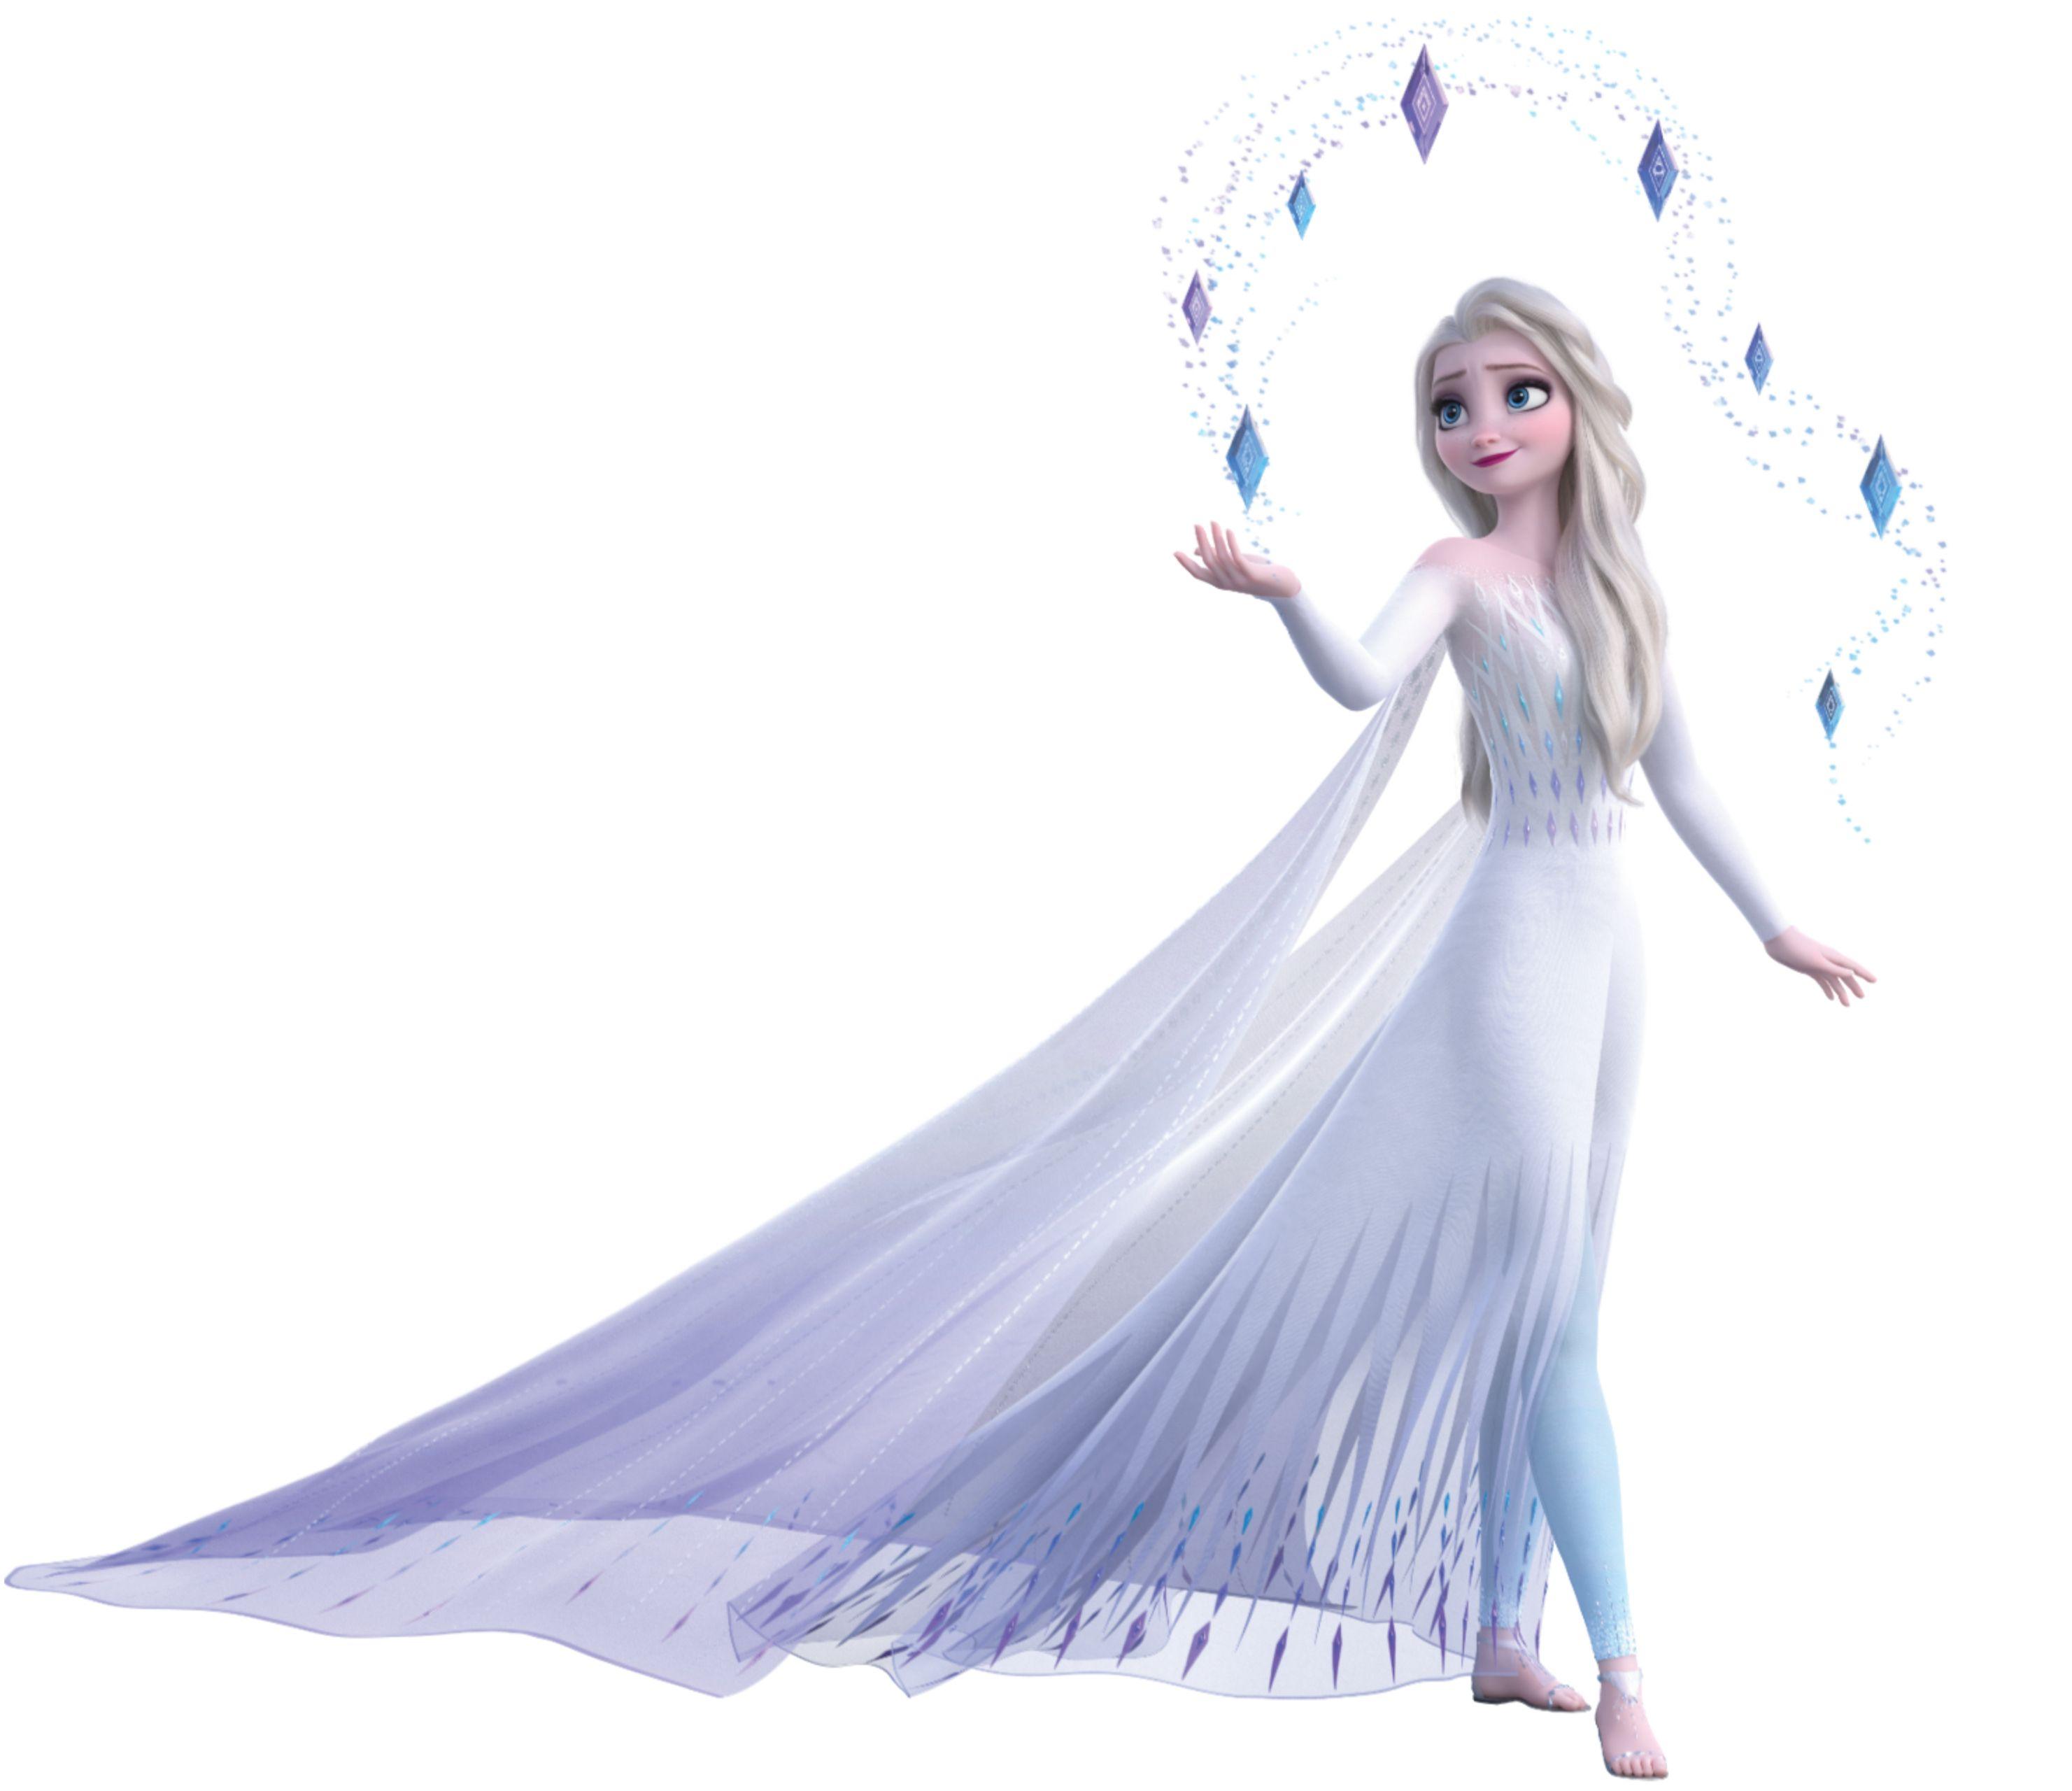 Elsa Gallery Disney Wiki Fandom In 2020 Frozen Elsa Dress Queen Elsa Disney Elsa